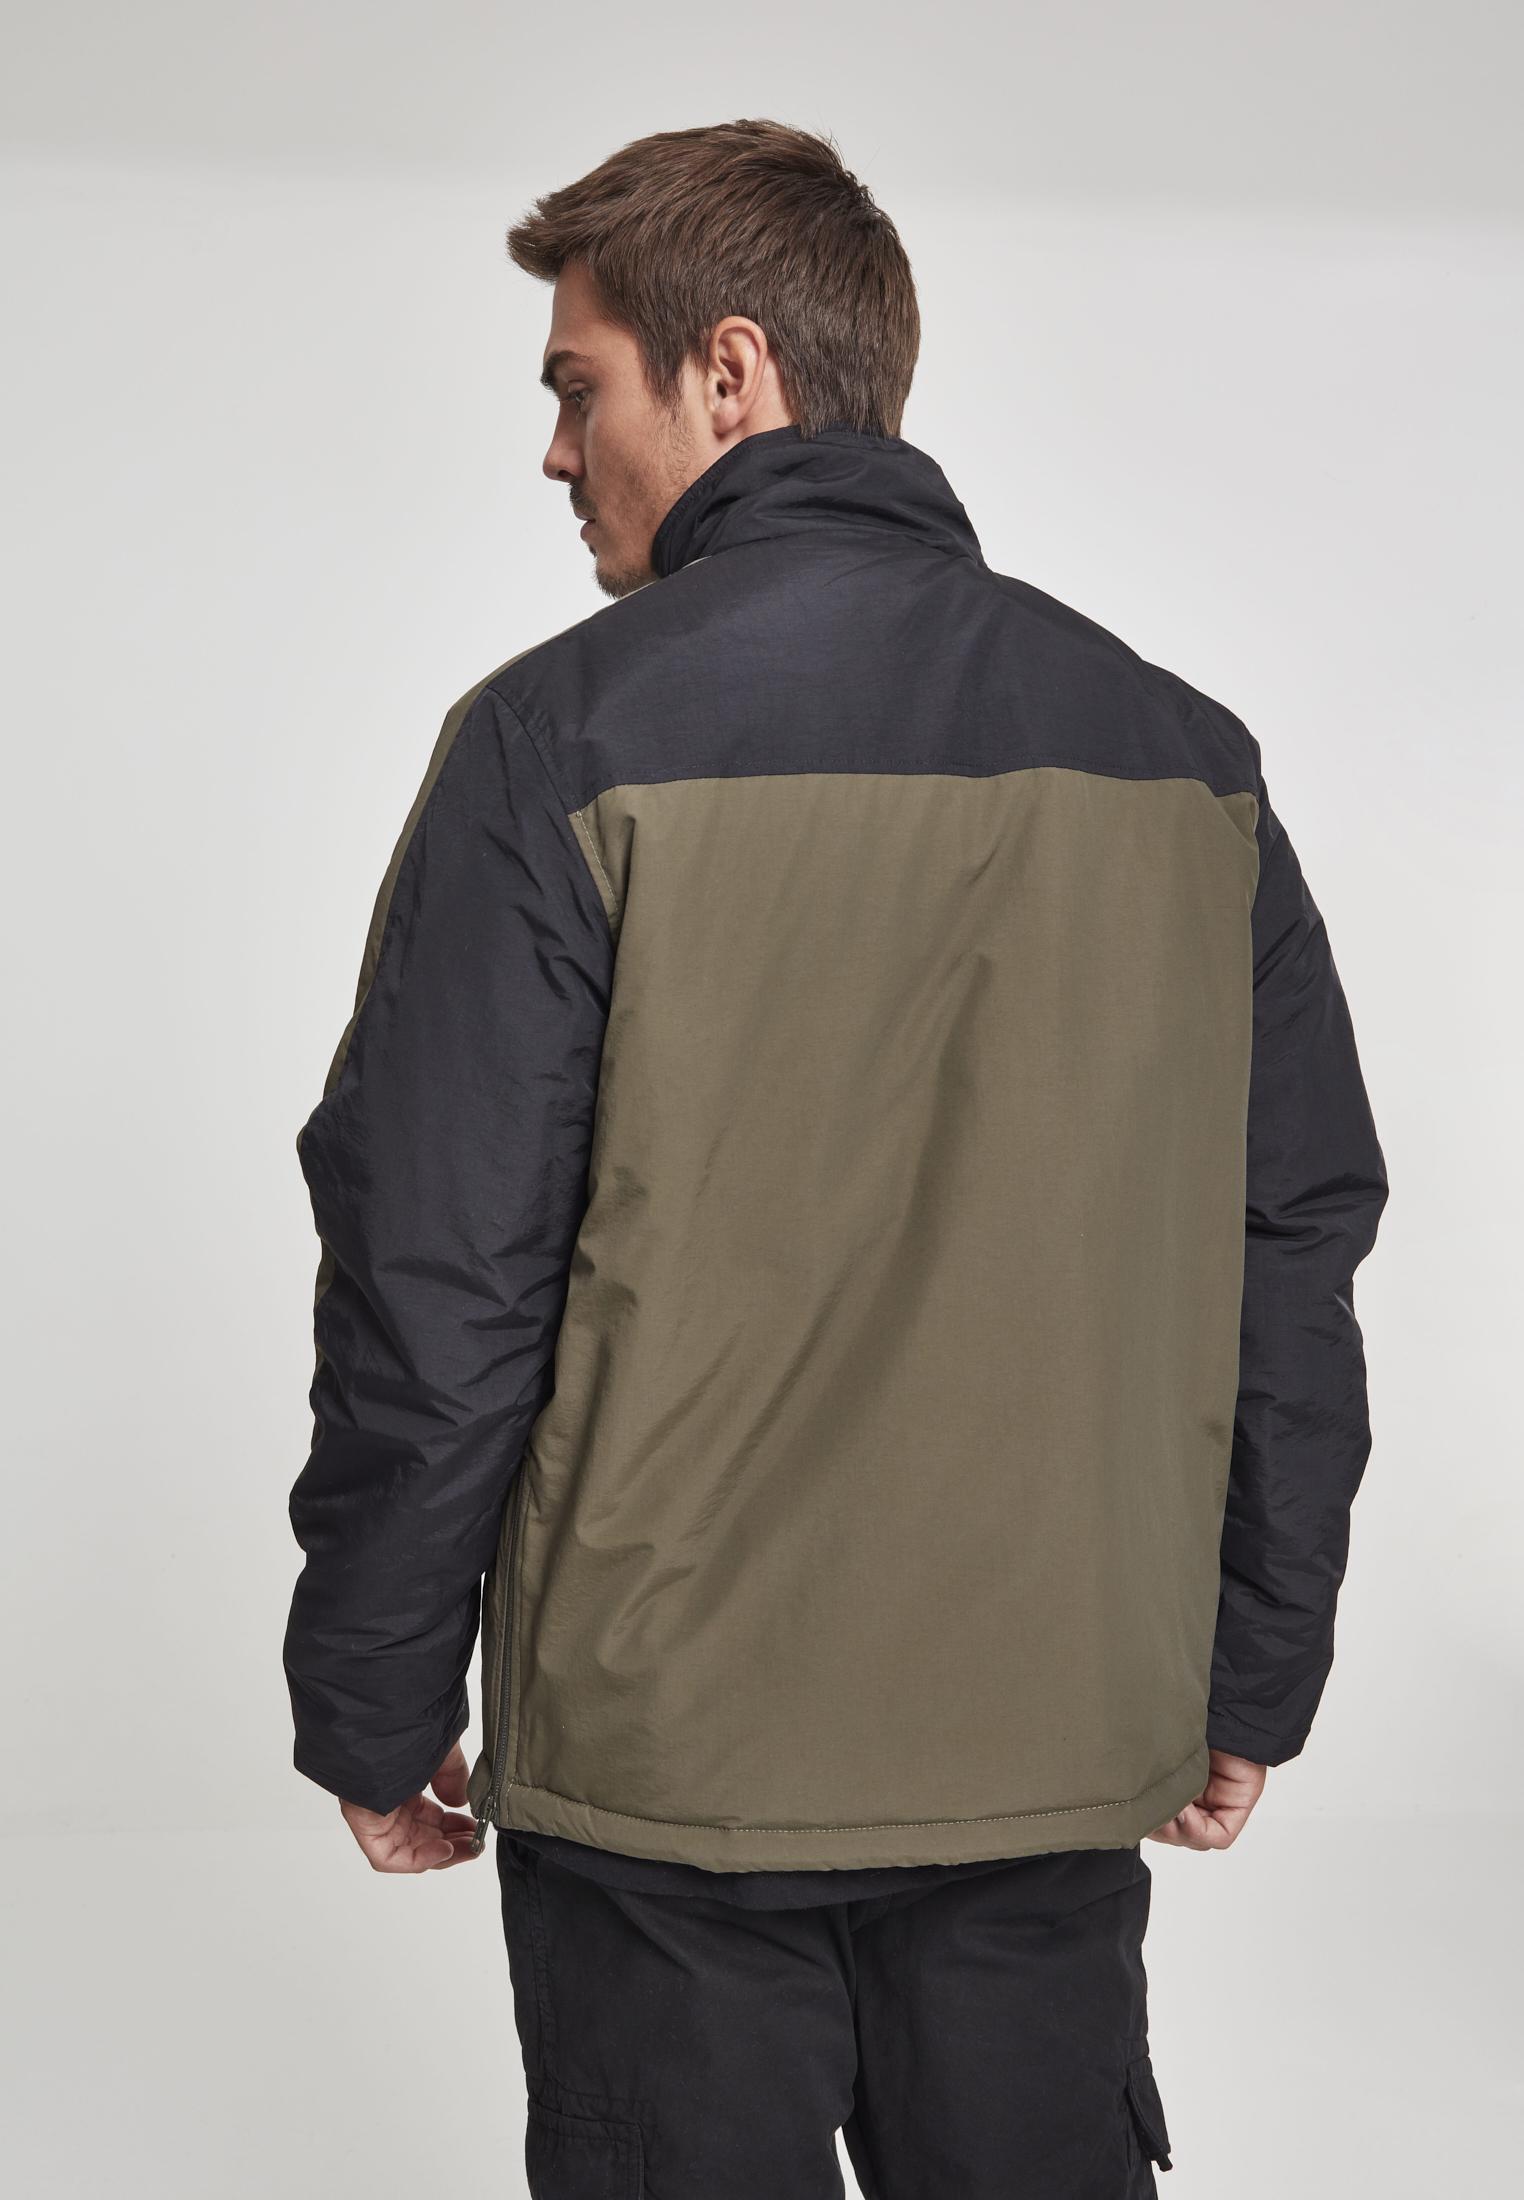 Urban Classics señores Windbreaker lluvia chaqueta chaqueta 2-Tone Padded pull over